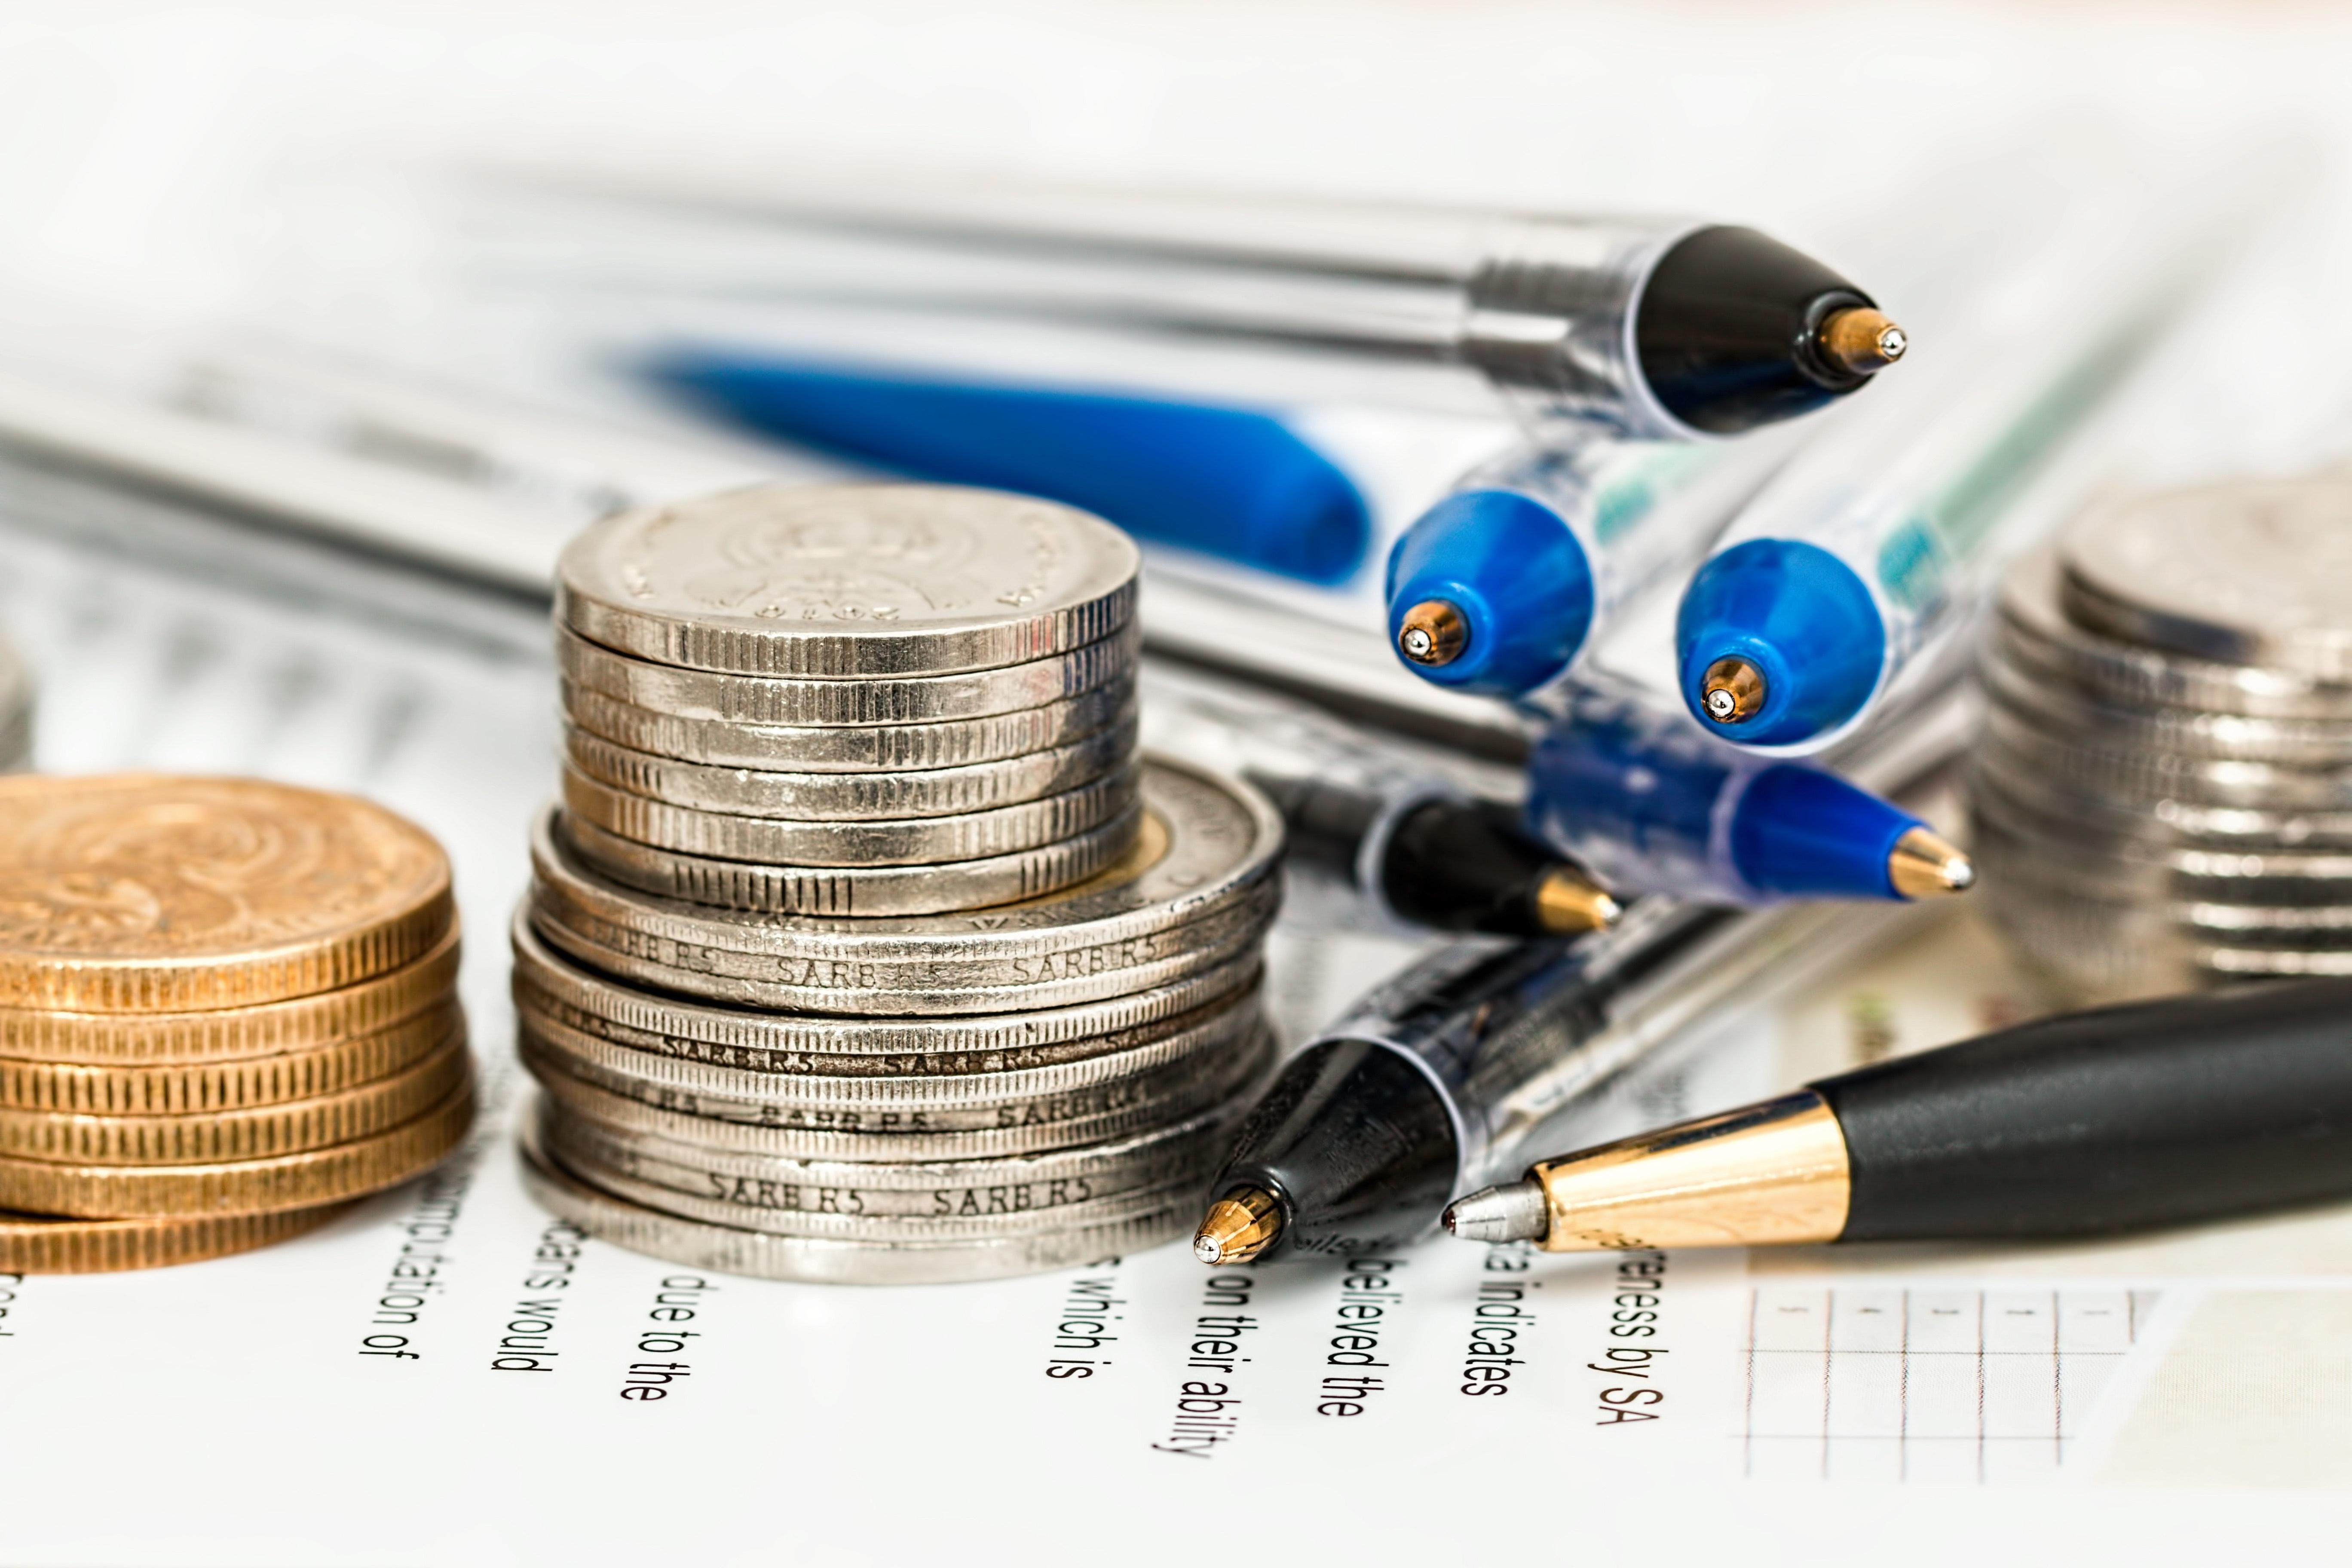 budget-cash-coins-33692 (1)